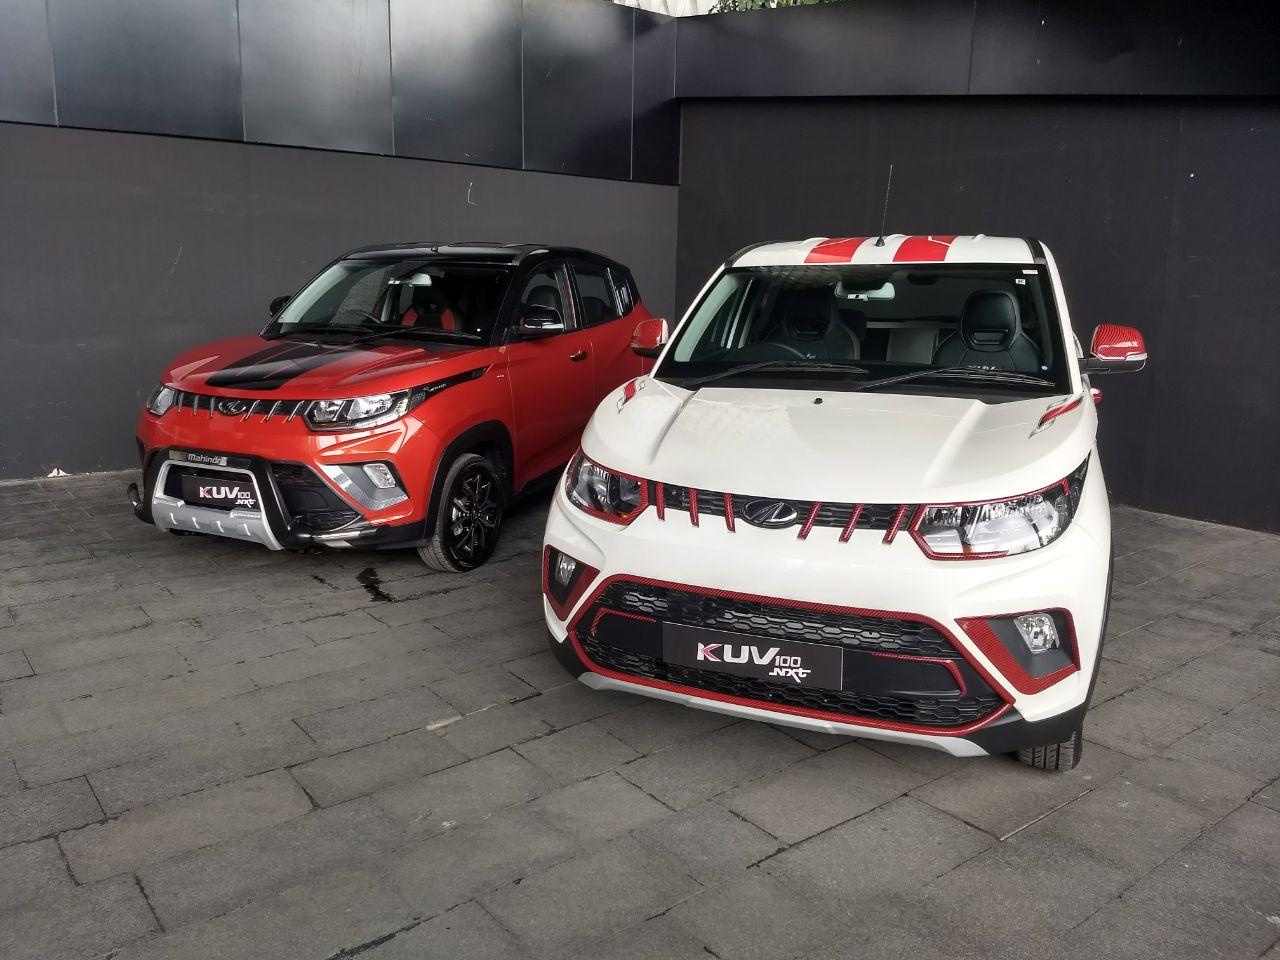 Mahindra Kuv100 Nxt India Launch Highlights Price | 2018, 2019, 2020 Ford Cars